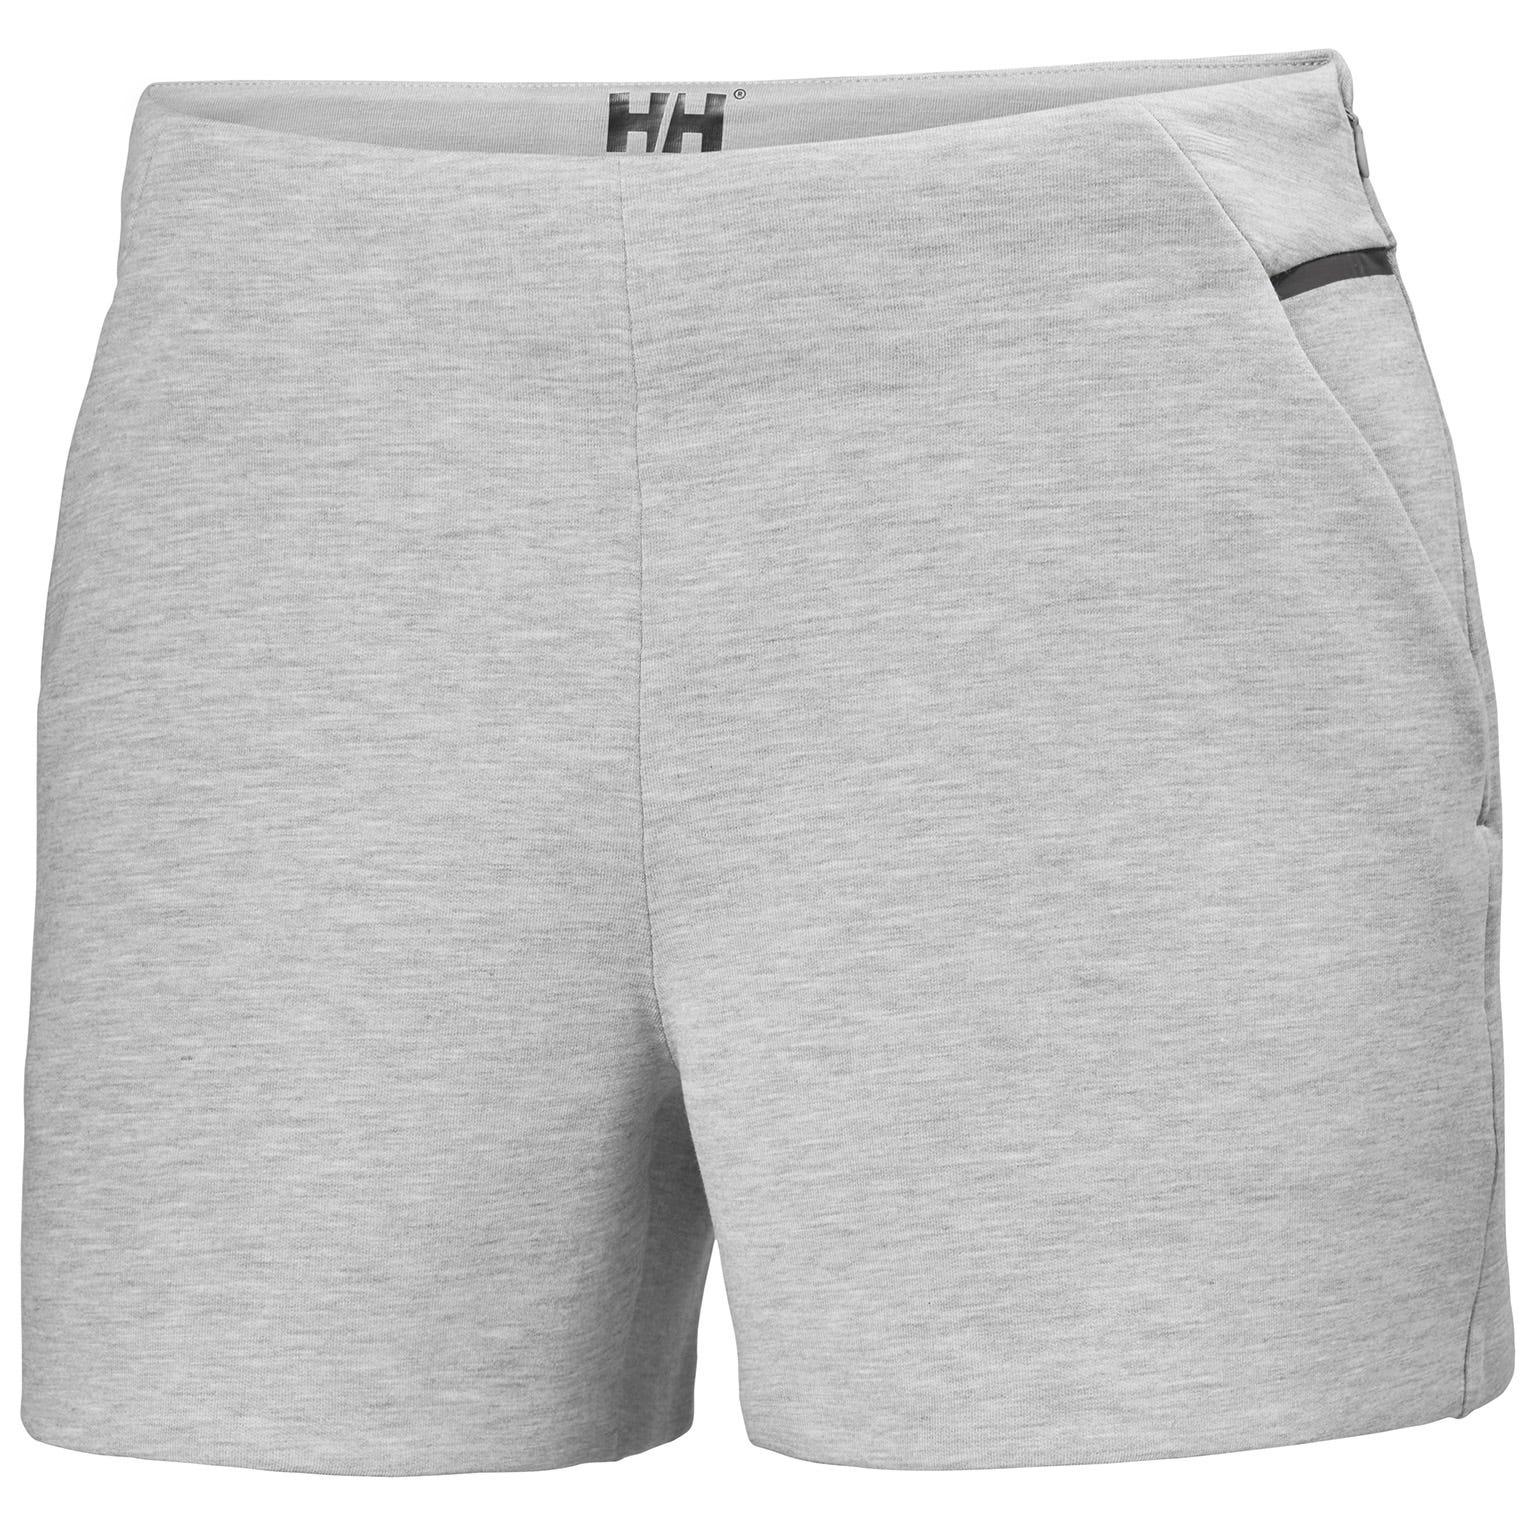 Helly Hansen Dame Hp Ocean Swt Shorts Seilerbukse Grå XS